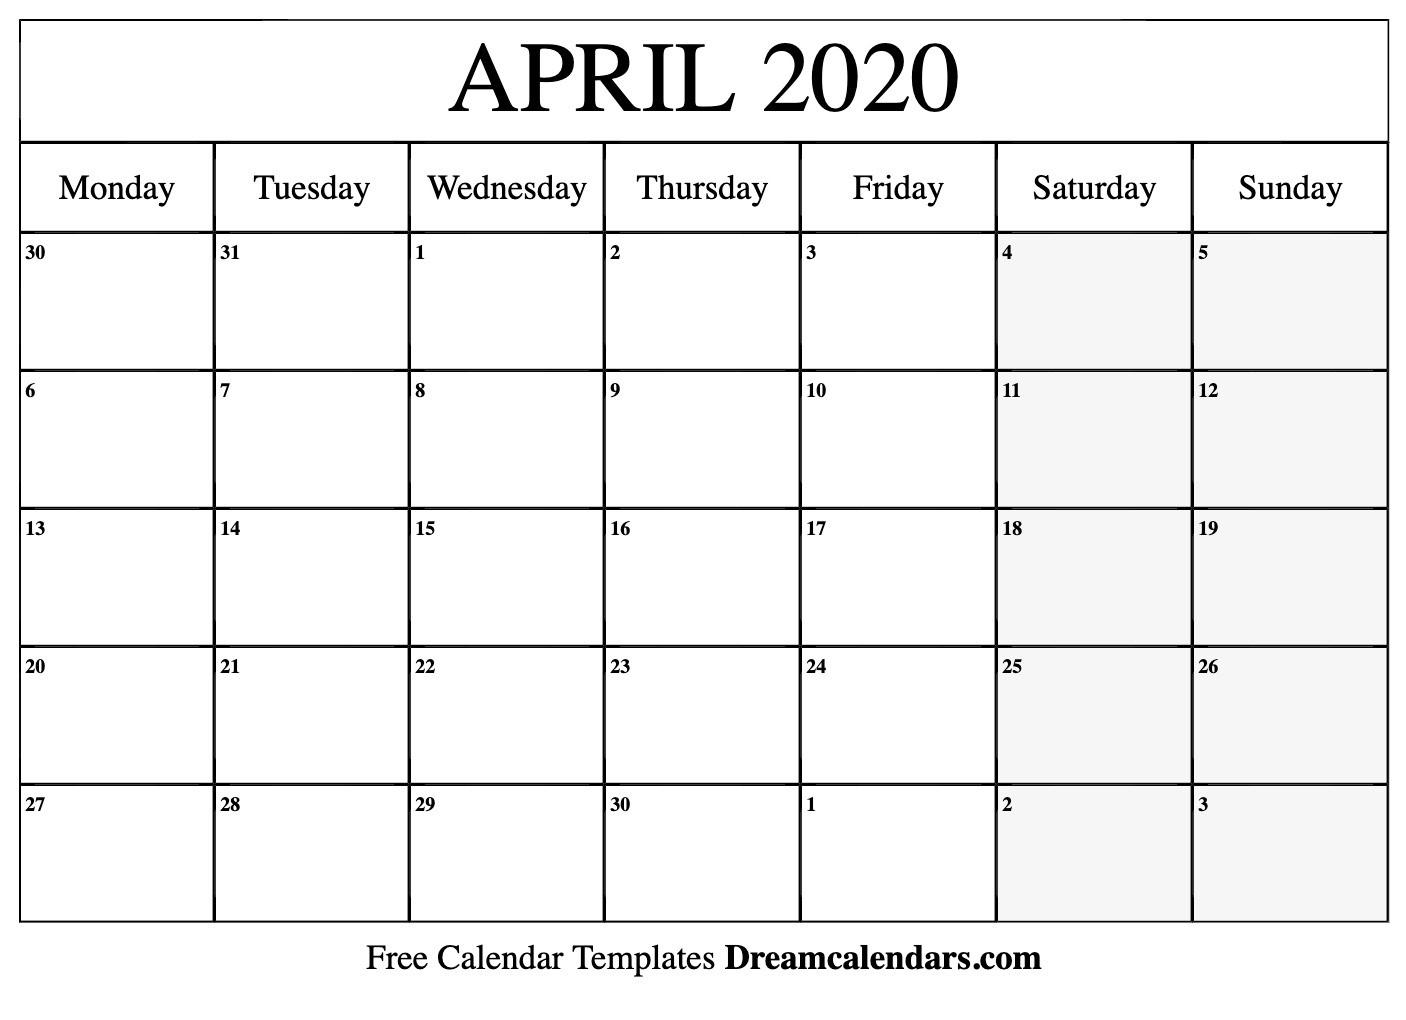 Free April 2020 Calendar  Topa.mastersathletics.co in April 2020 Printable Calendar